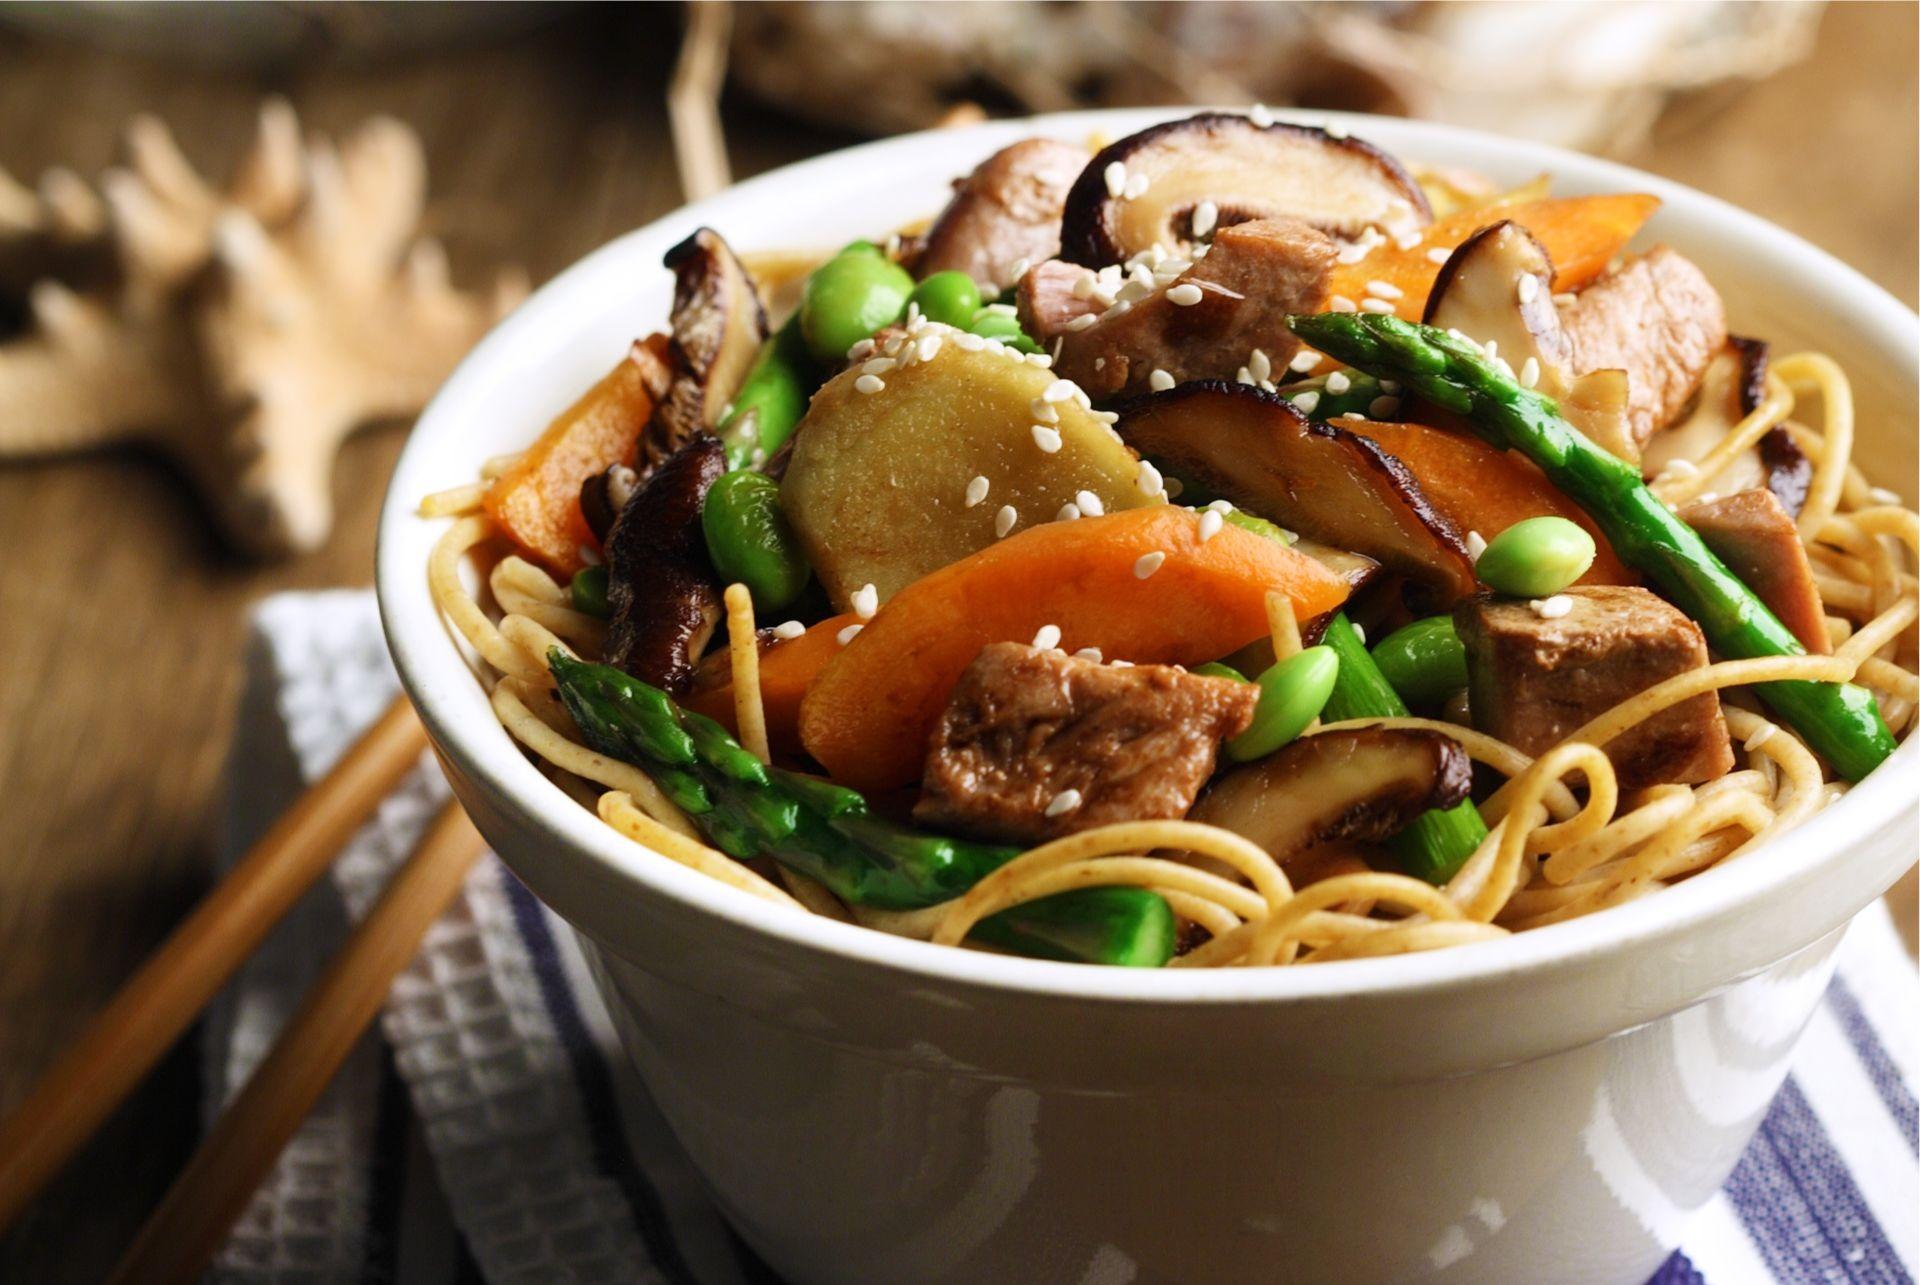 Bowl of vermicelli noodles, edamame, shiitake mushrooms, tuna steak, carrot and asparagus spears